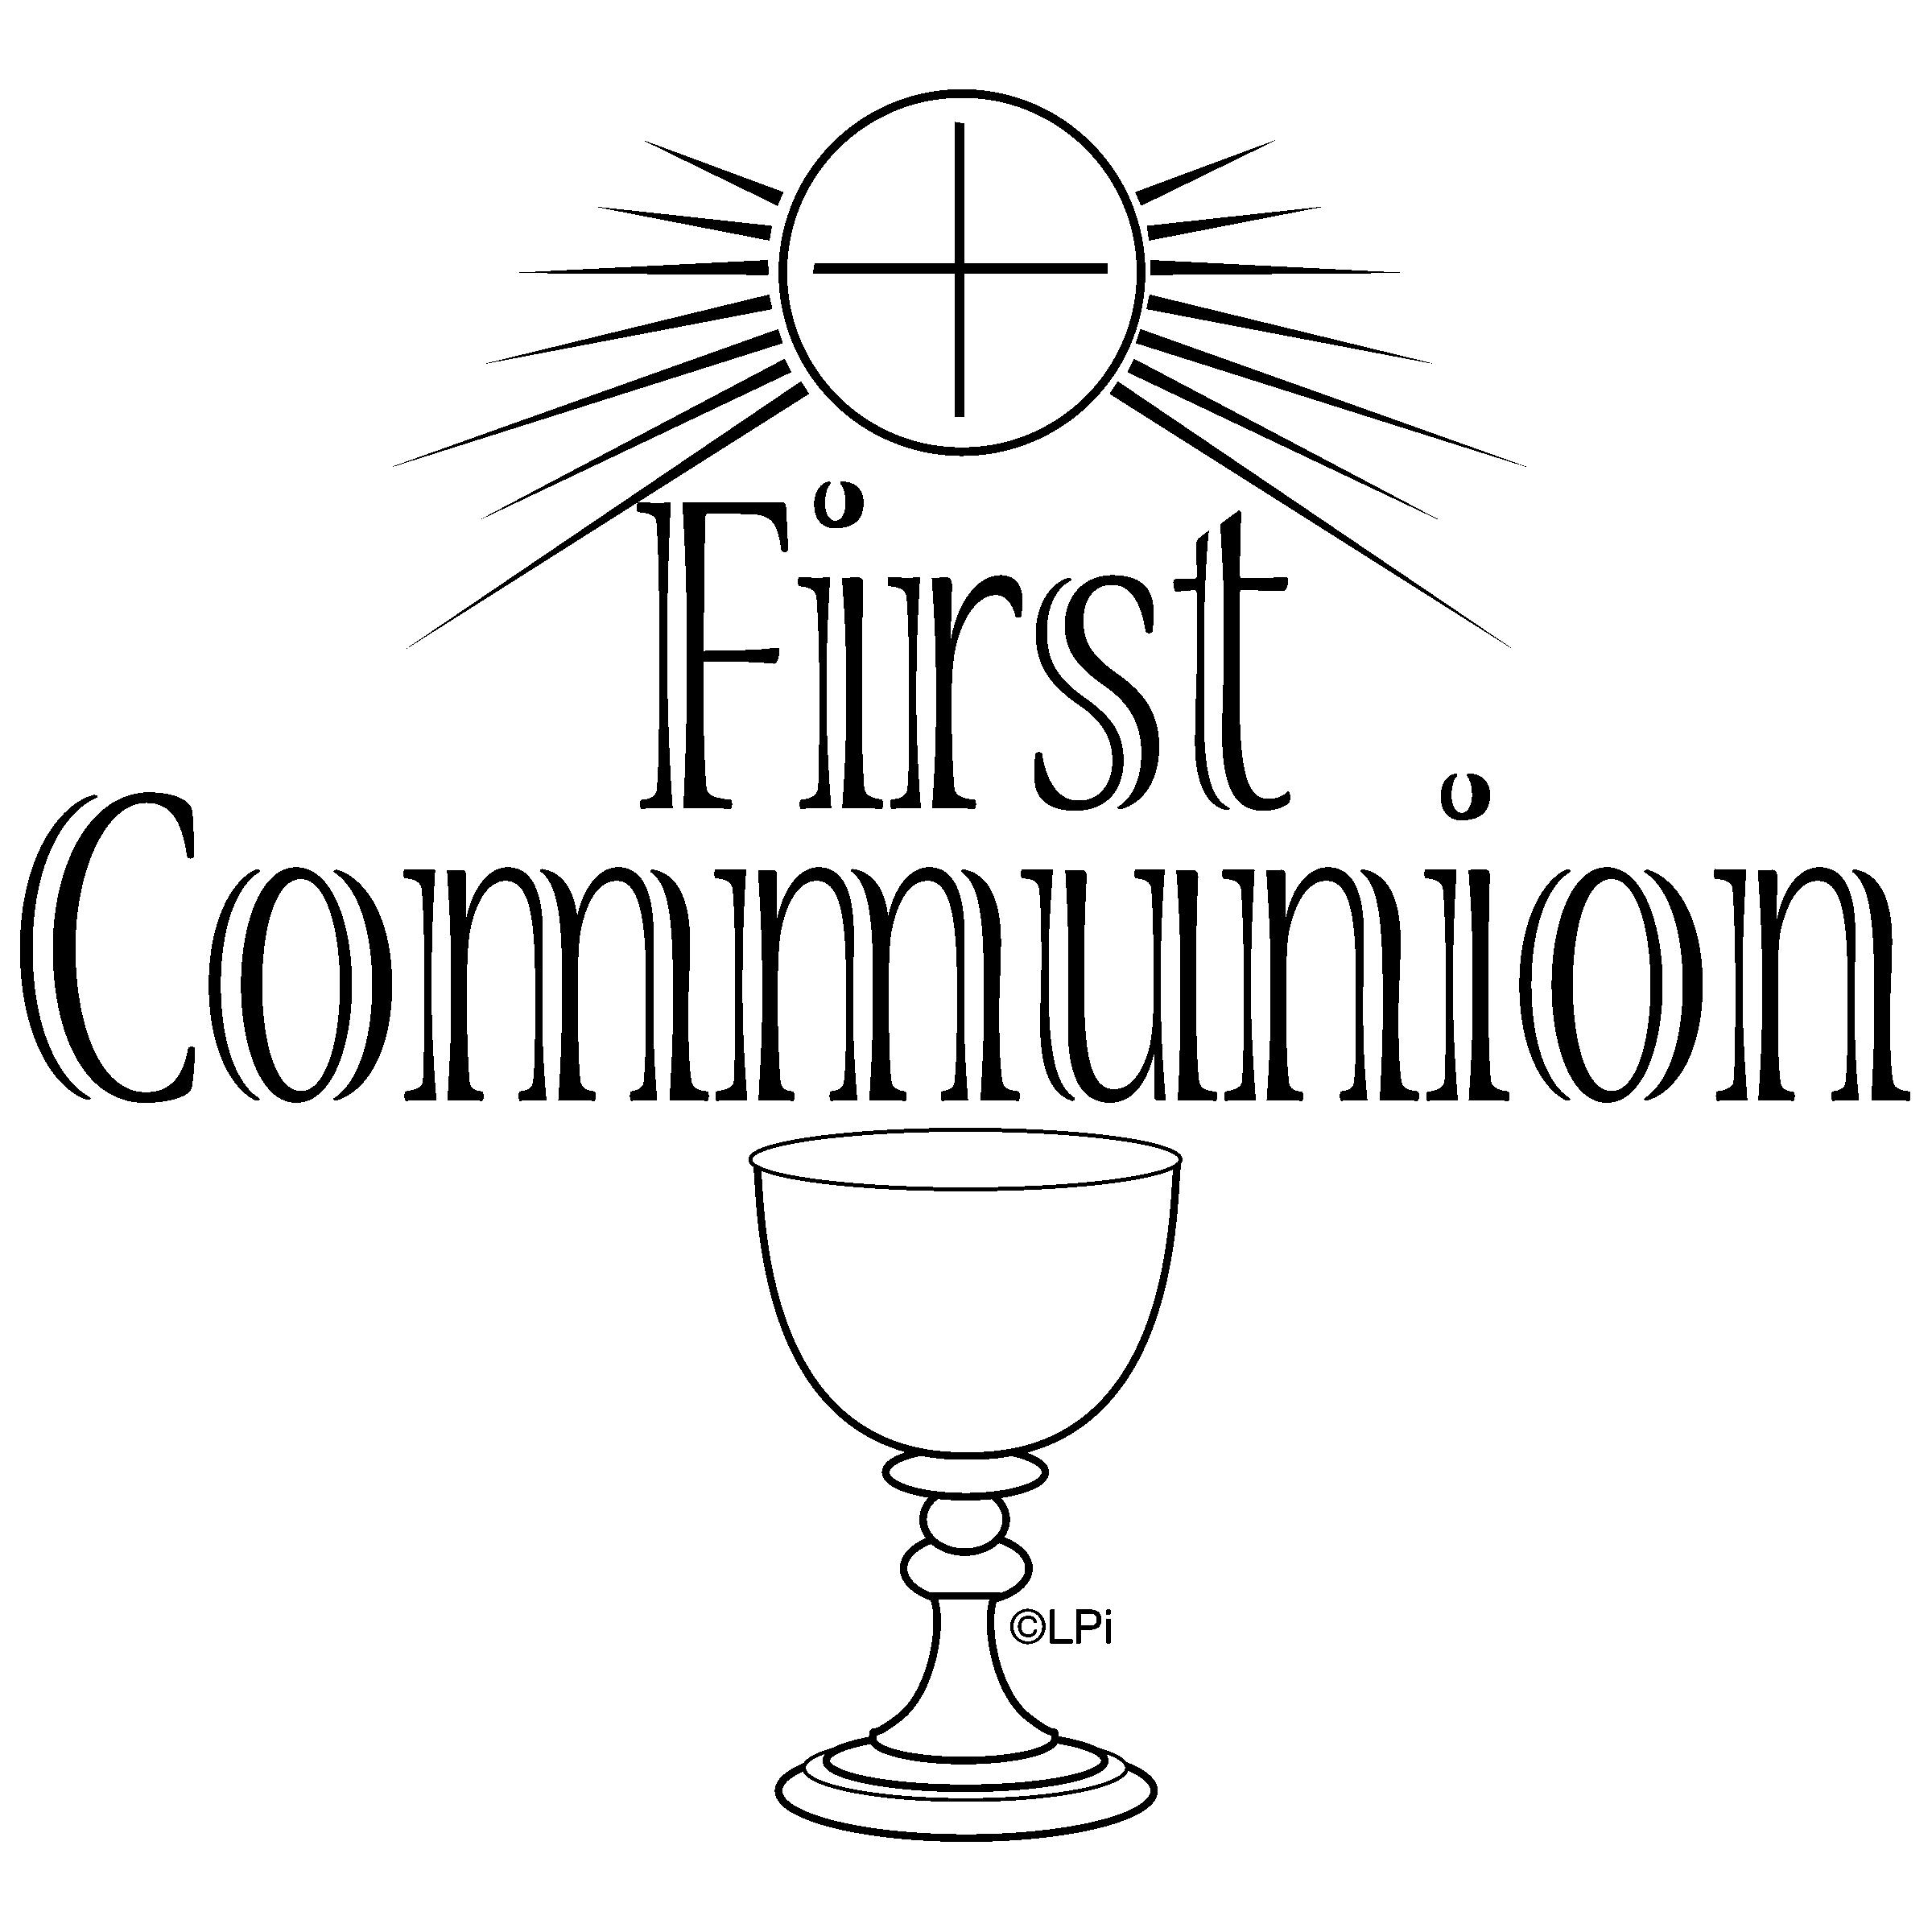 First Communion Firstmunion Clip Art Clipart Gclipart